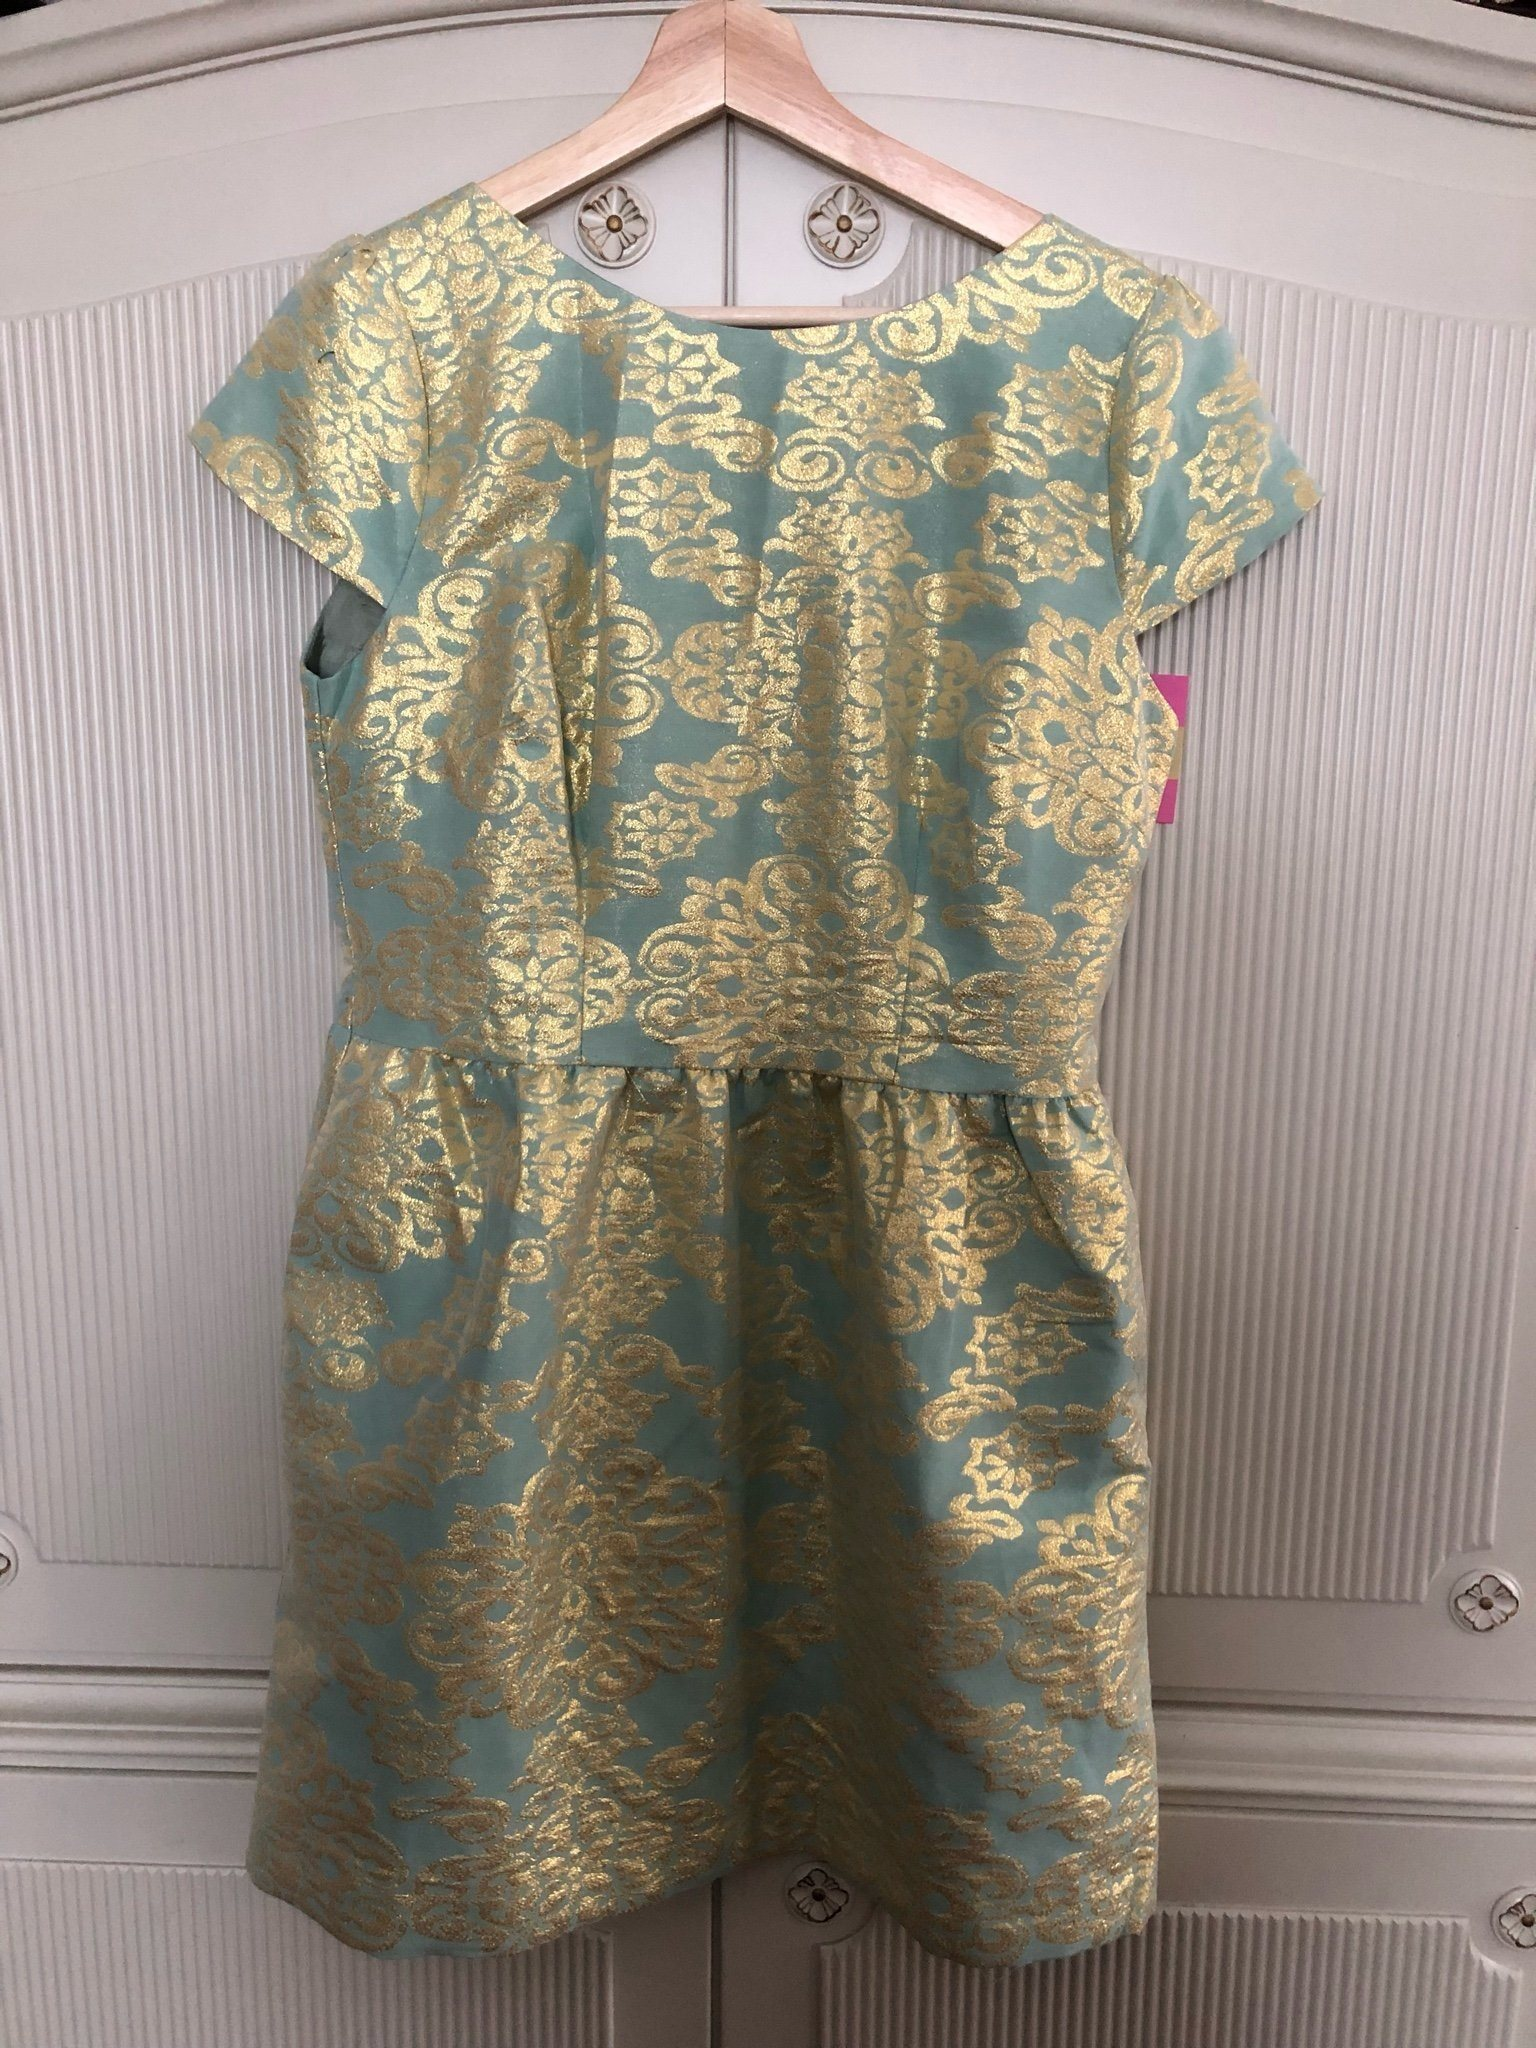 2fdc03a1c930 Turkos-metallic Stl L- Cute Metallic Dress - Pernilla Wahlgren Collection  ...